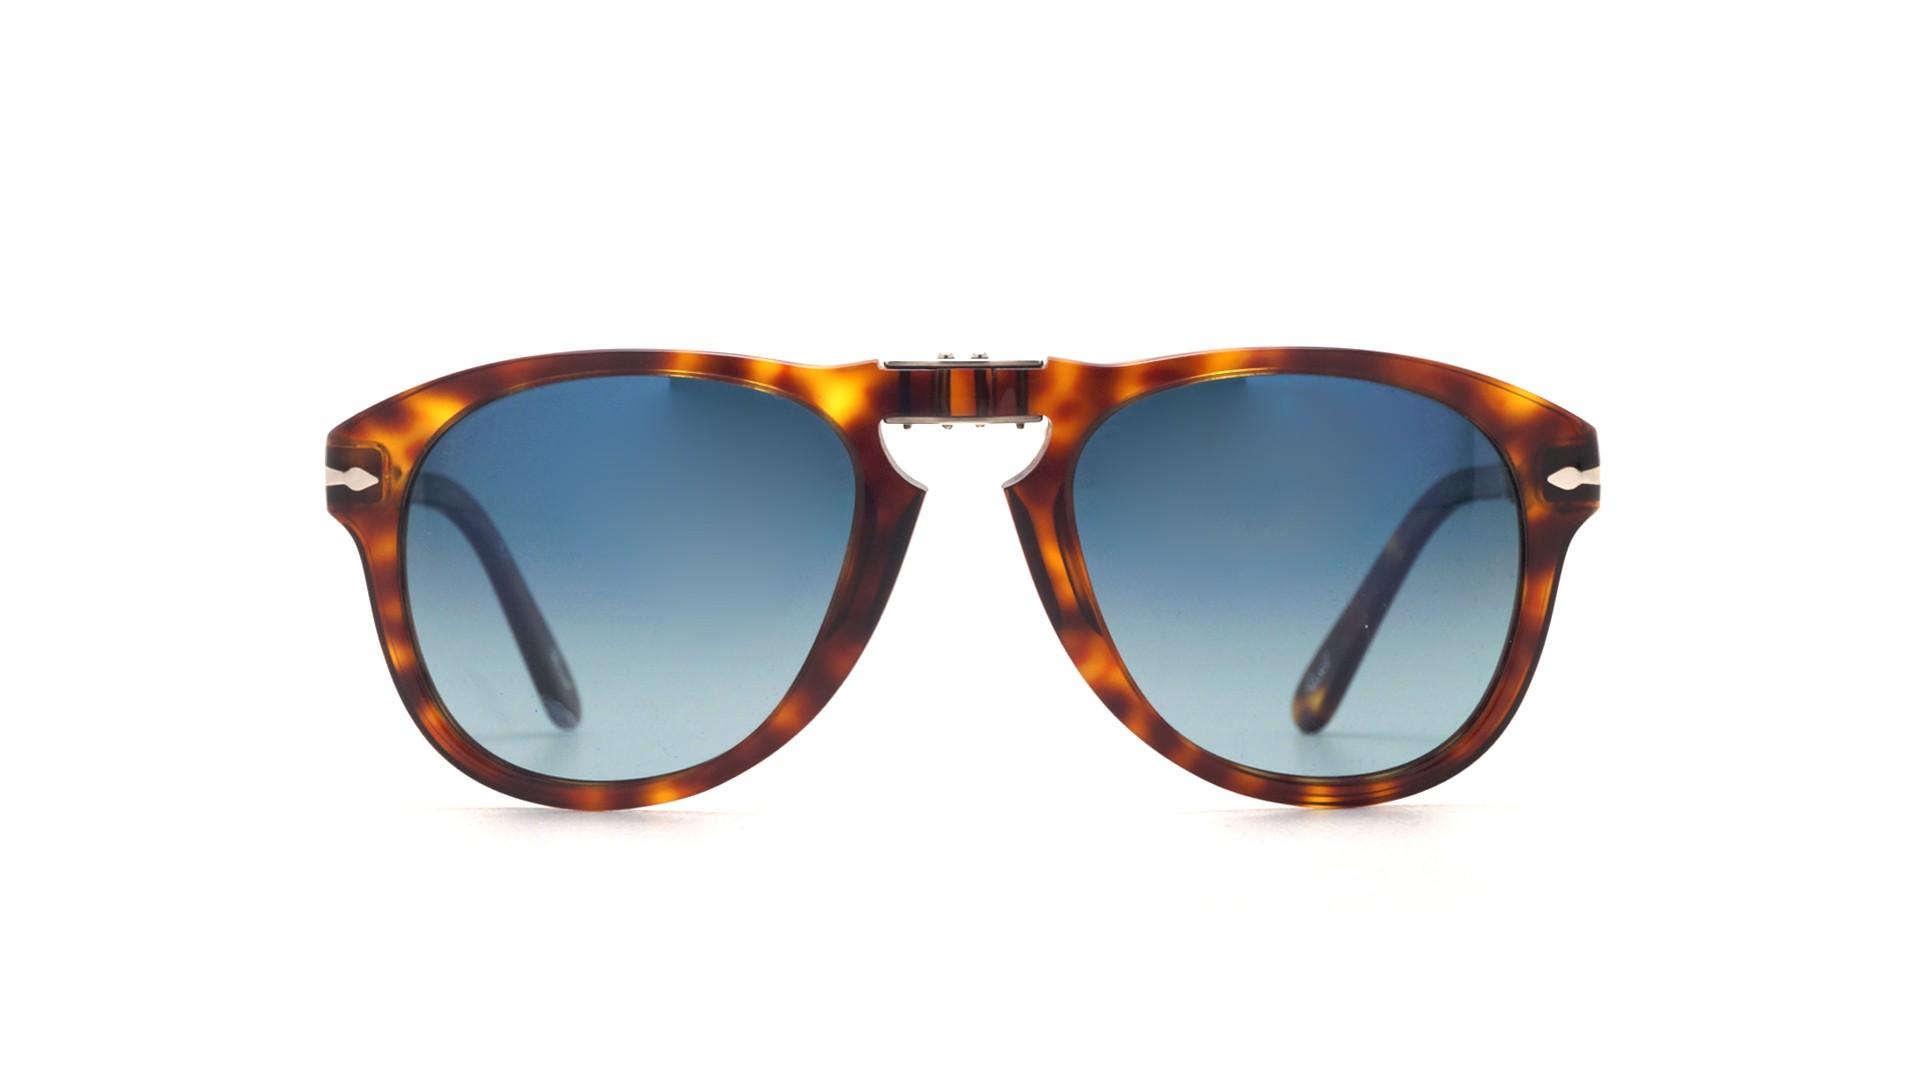 bd6ef2132cef Sunglasses Persol Steve Mcqueen Tortoise PO0714SM 24/S3 54-21 Folding  Polarized. Medium. 52-21